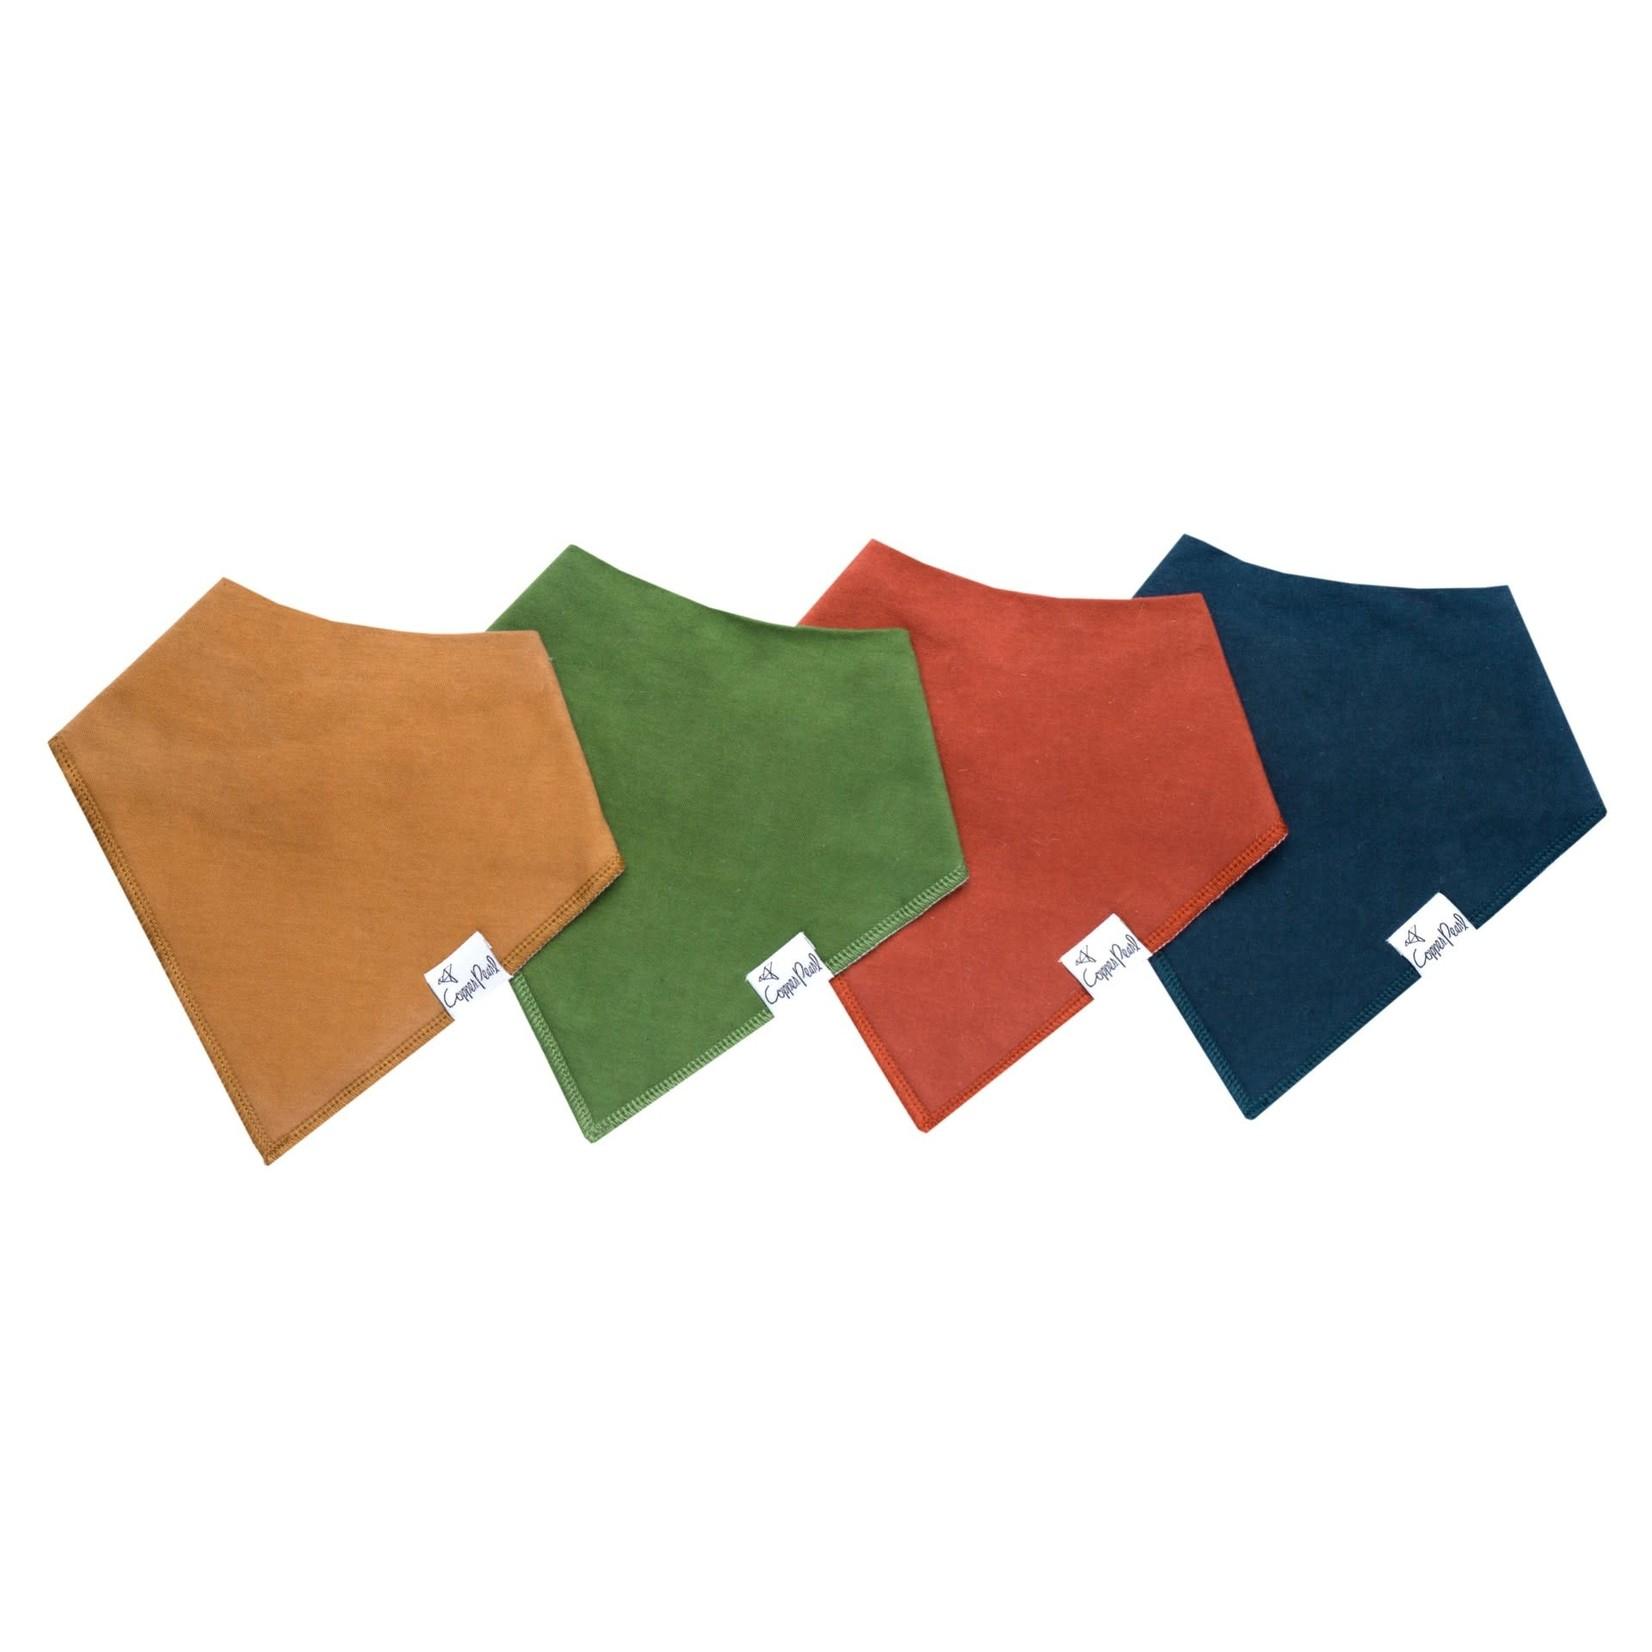 Copper Pearl Bibs - Ridge Set - 4 pack